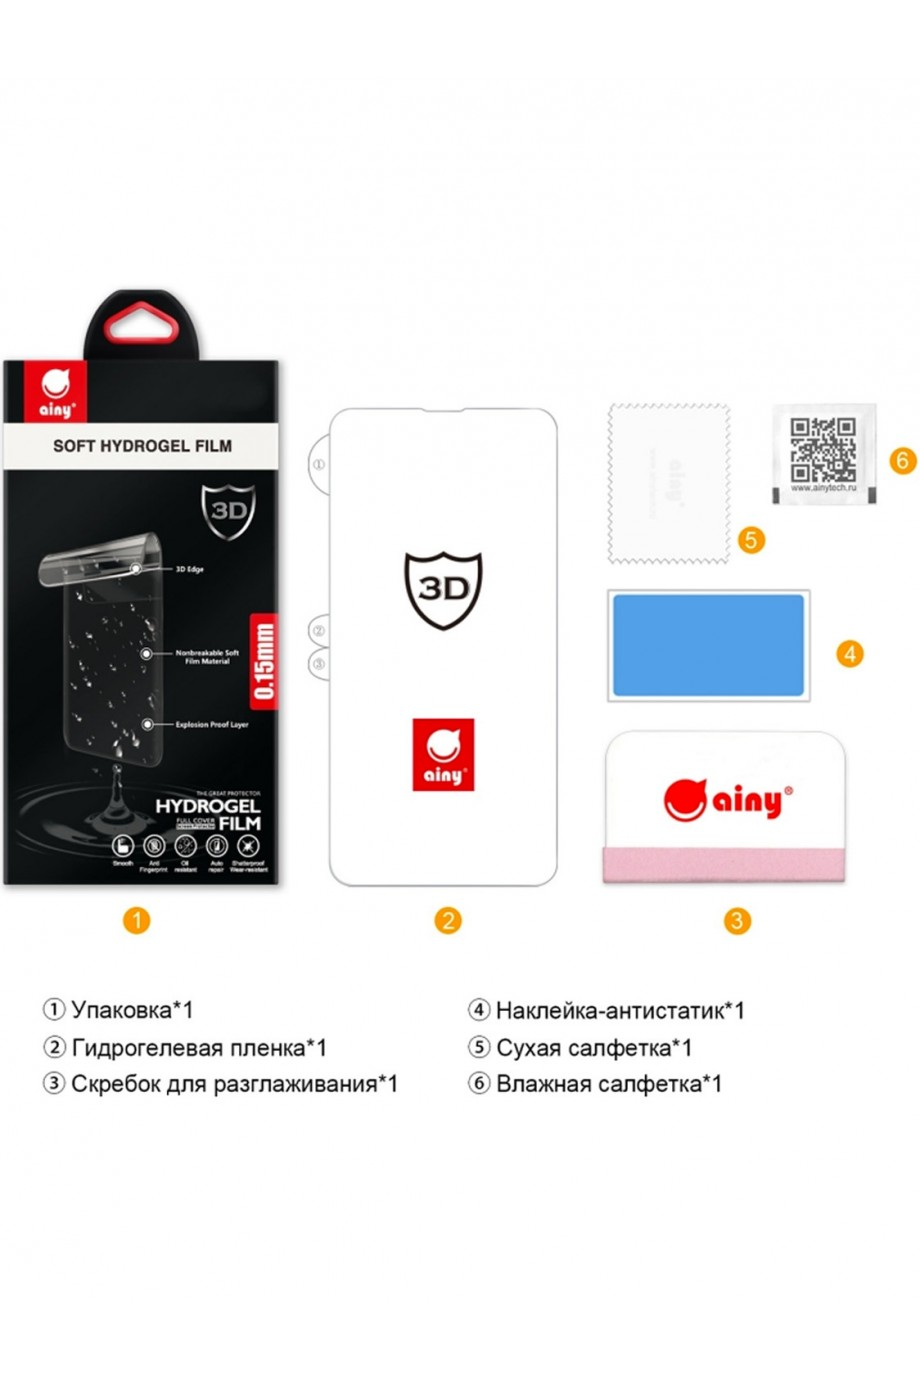 Гидрогелевая пленка 3D Ainy для Xiaomi Redmi 6A